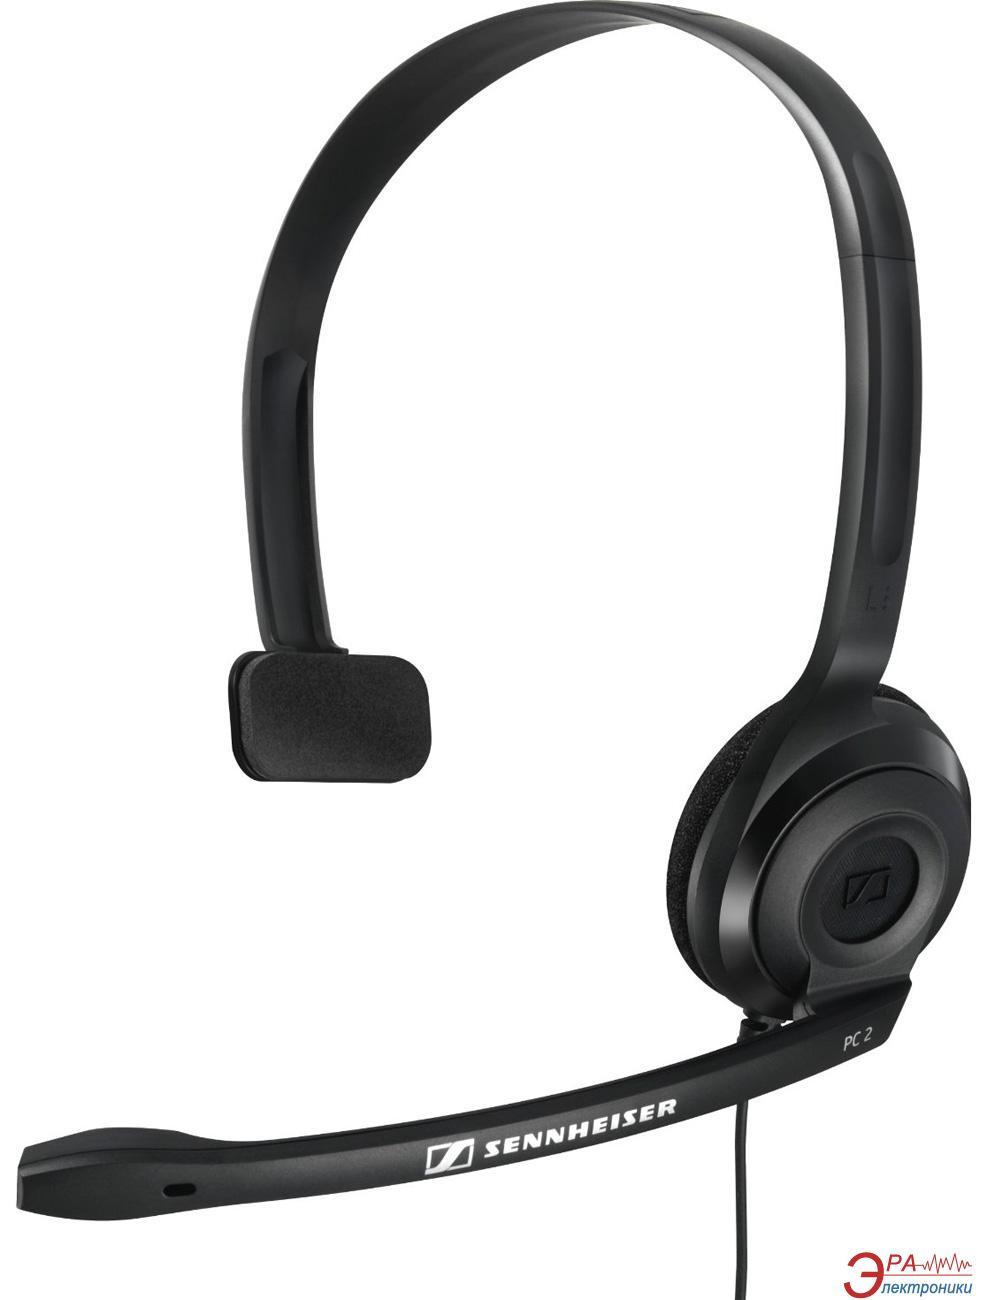 Гарнитура Sennheiser Communications PC 2 CHAT black